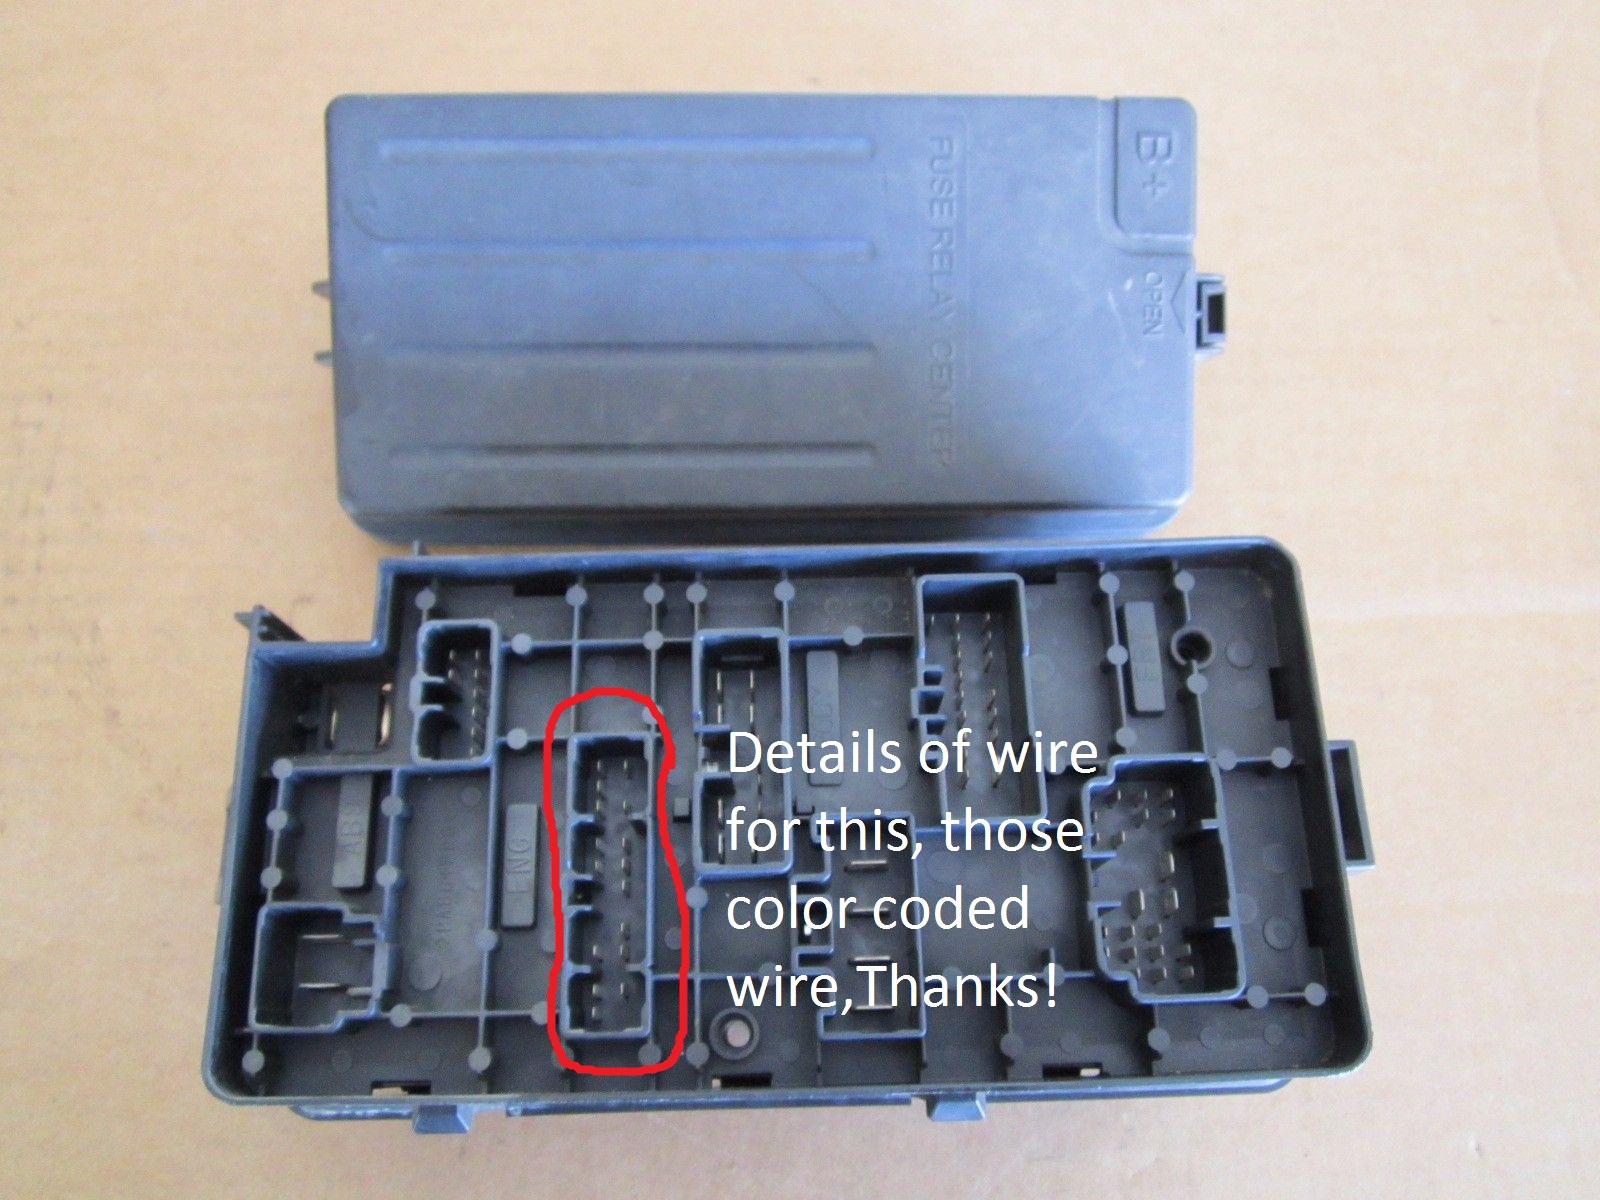 Chevrolet Optra 16 2005 Wiring Problem Hi I Have A Problem